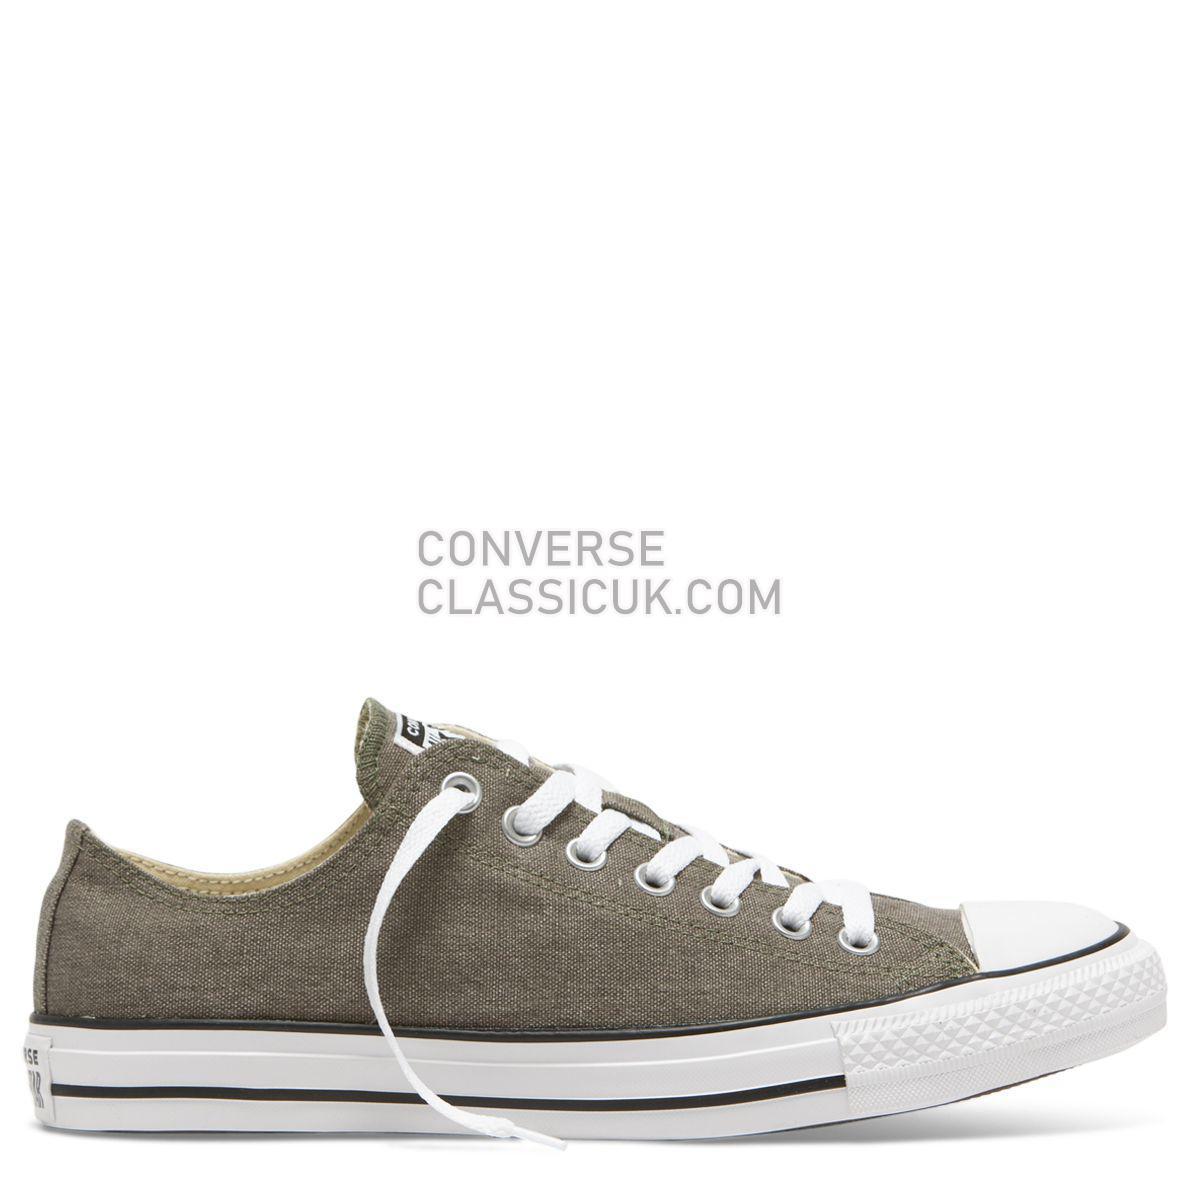 Converse Chuck Taylor Washed Ashore Low Top Field Surplus Mens Womens Unisex 164289 Field Surplus/White/Black Shoes